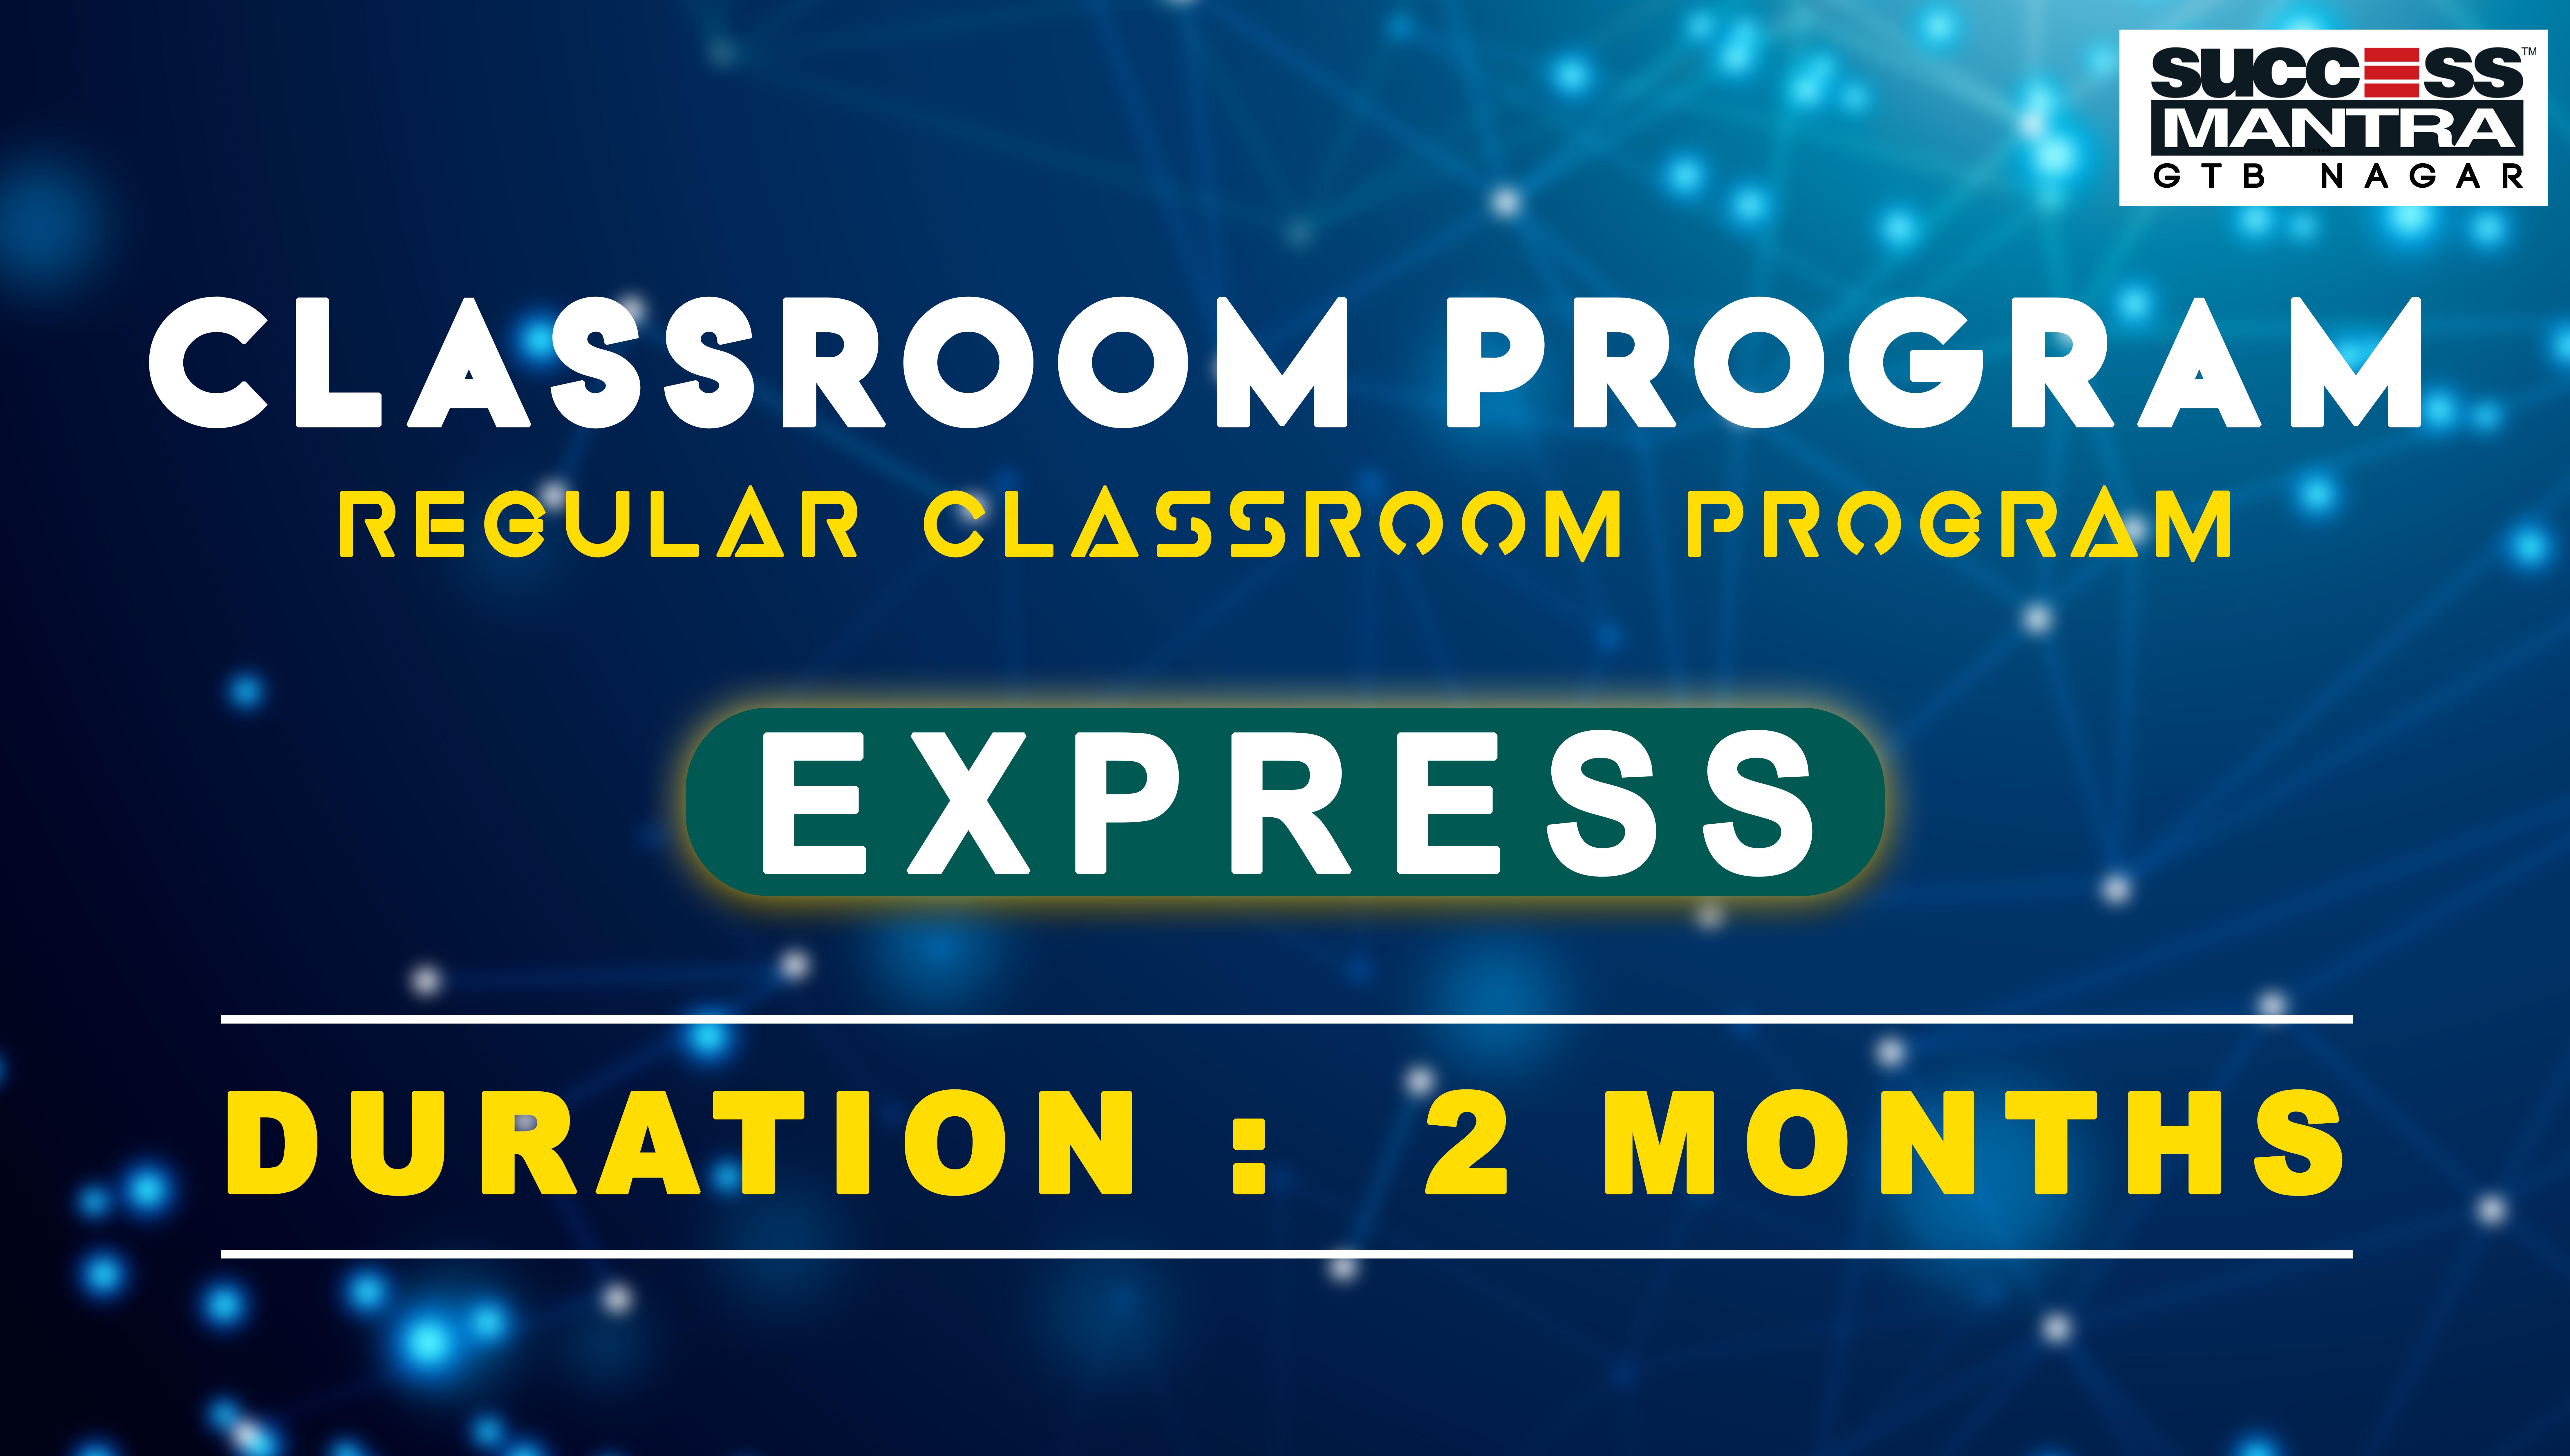 CLAT Classroom Coaching Program | EXPRESS Crash Course (Three months course) at Success Mantra | Success Mantra Coaching G.T.B Nagar